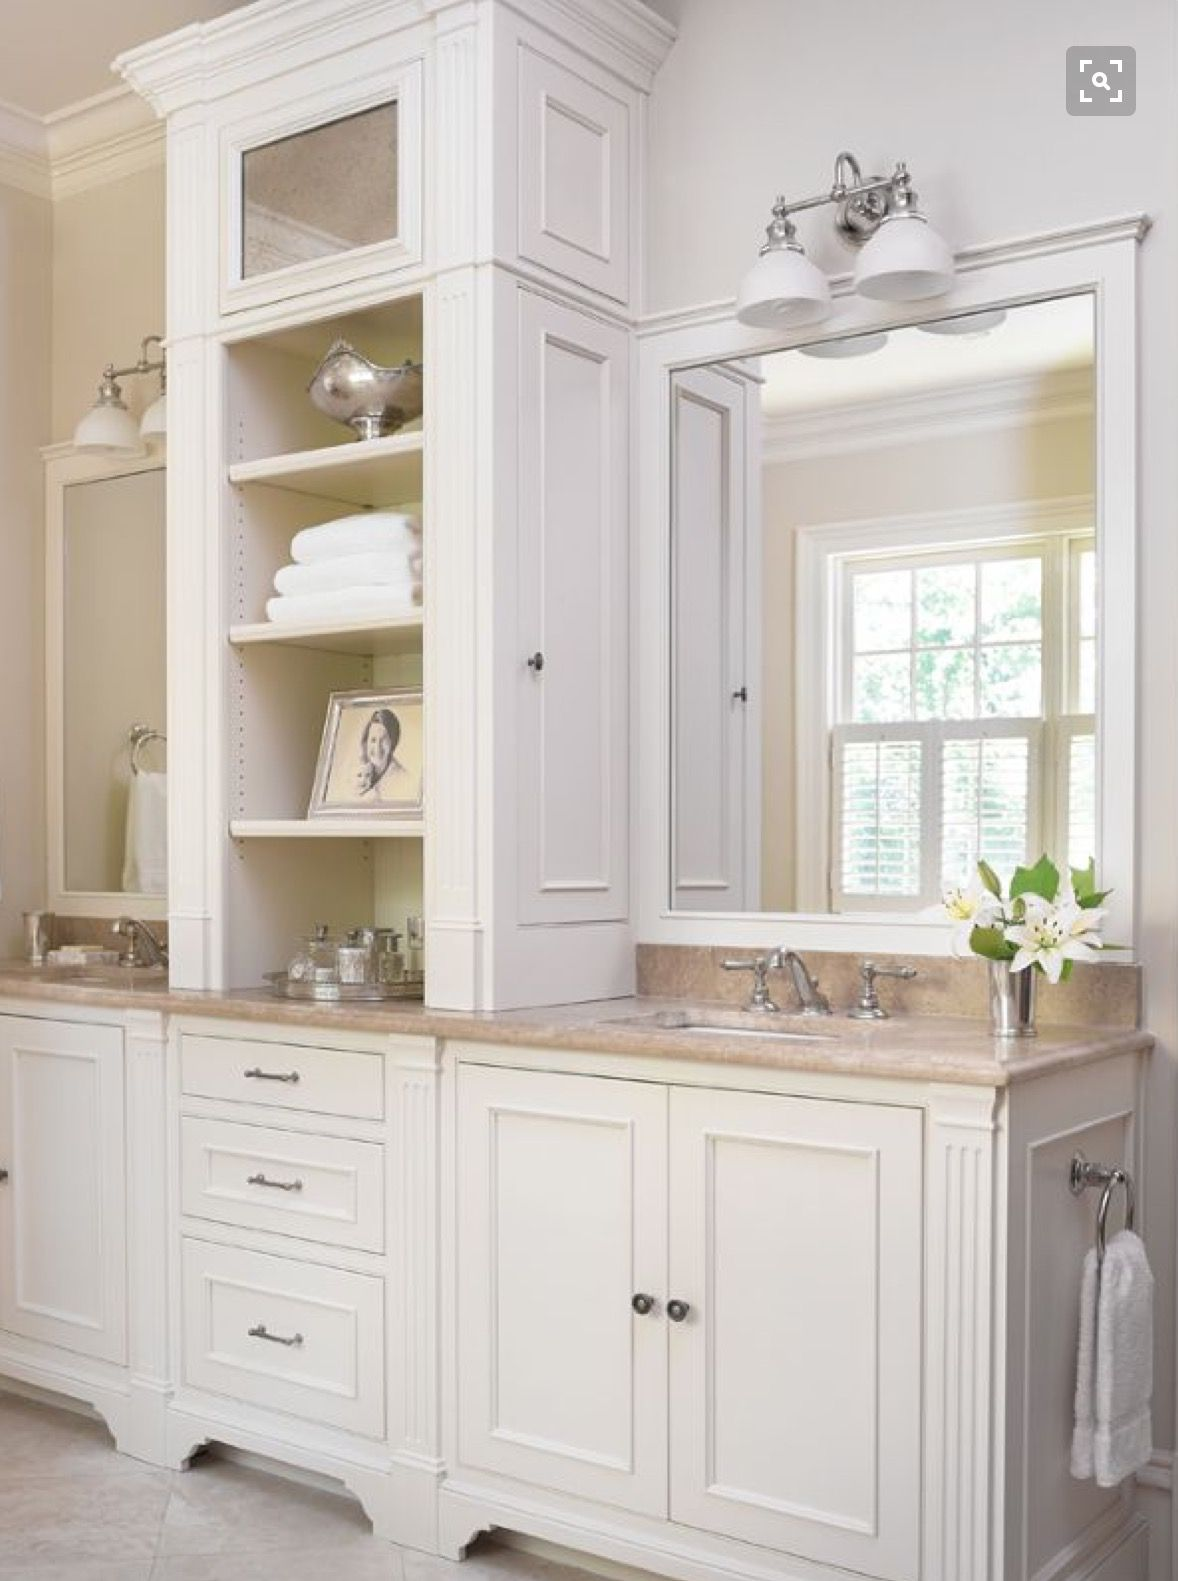 Pin by Bianca Ferrari on Home | Pinterest | Towel holders, Towels ...